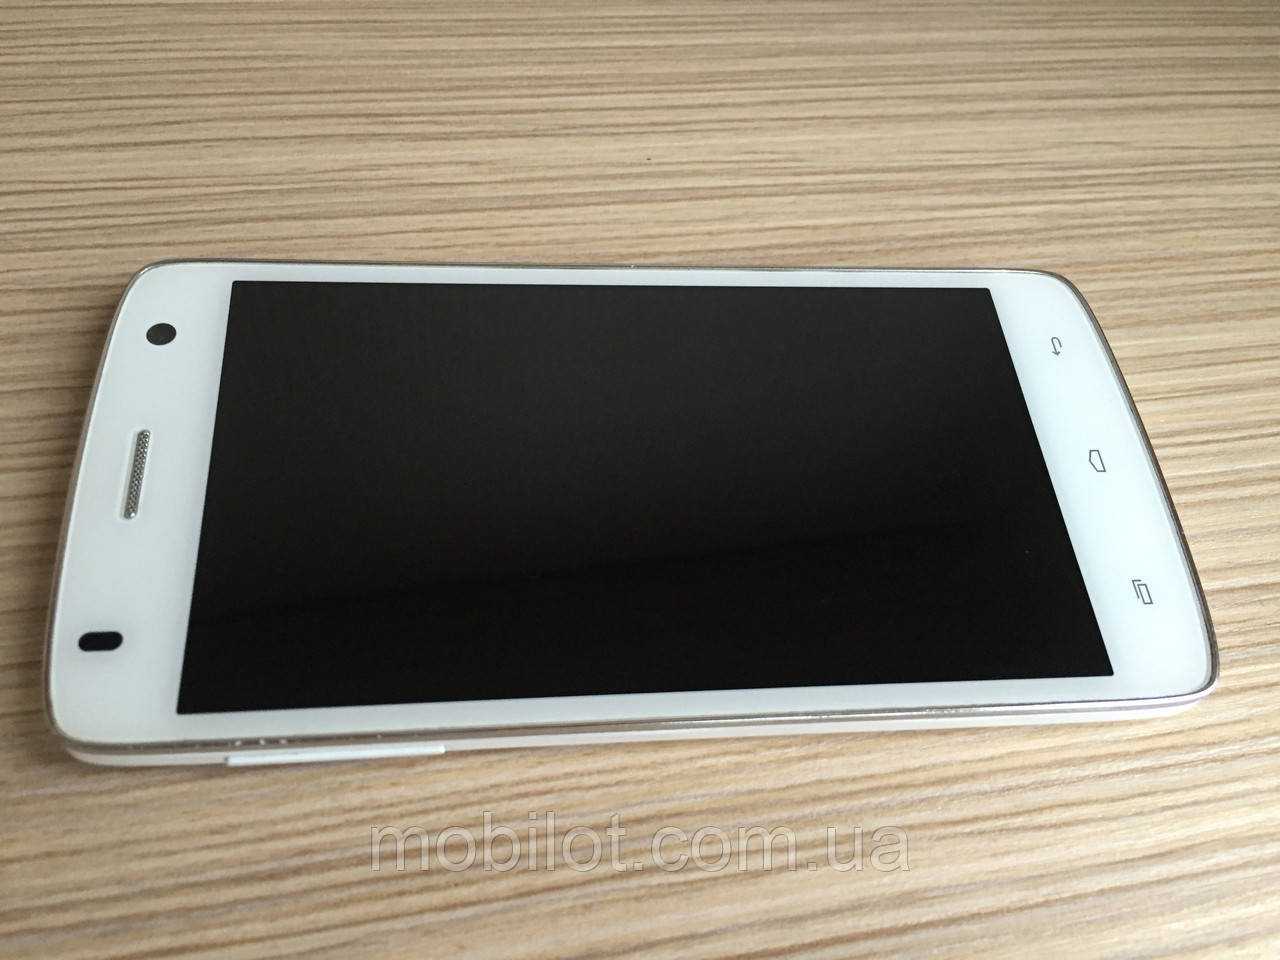 Мобильный телефон Fly IQ4503 Era Life 6 White (TZ-1067)